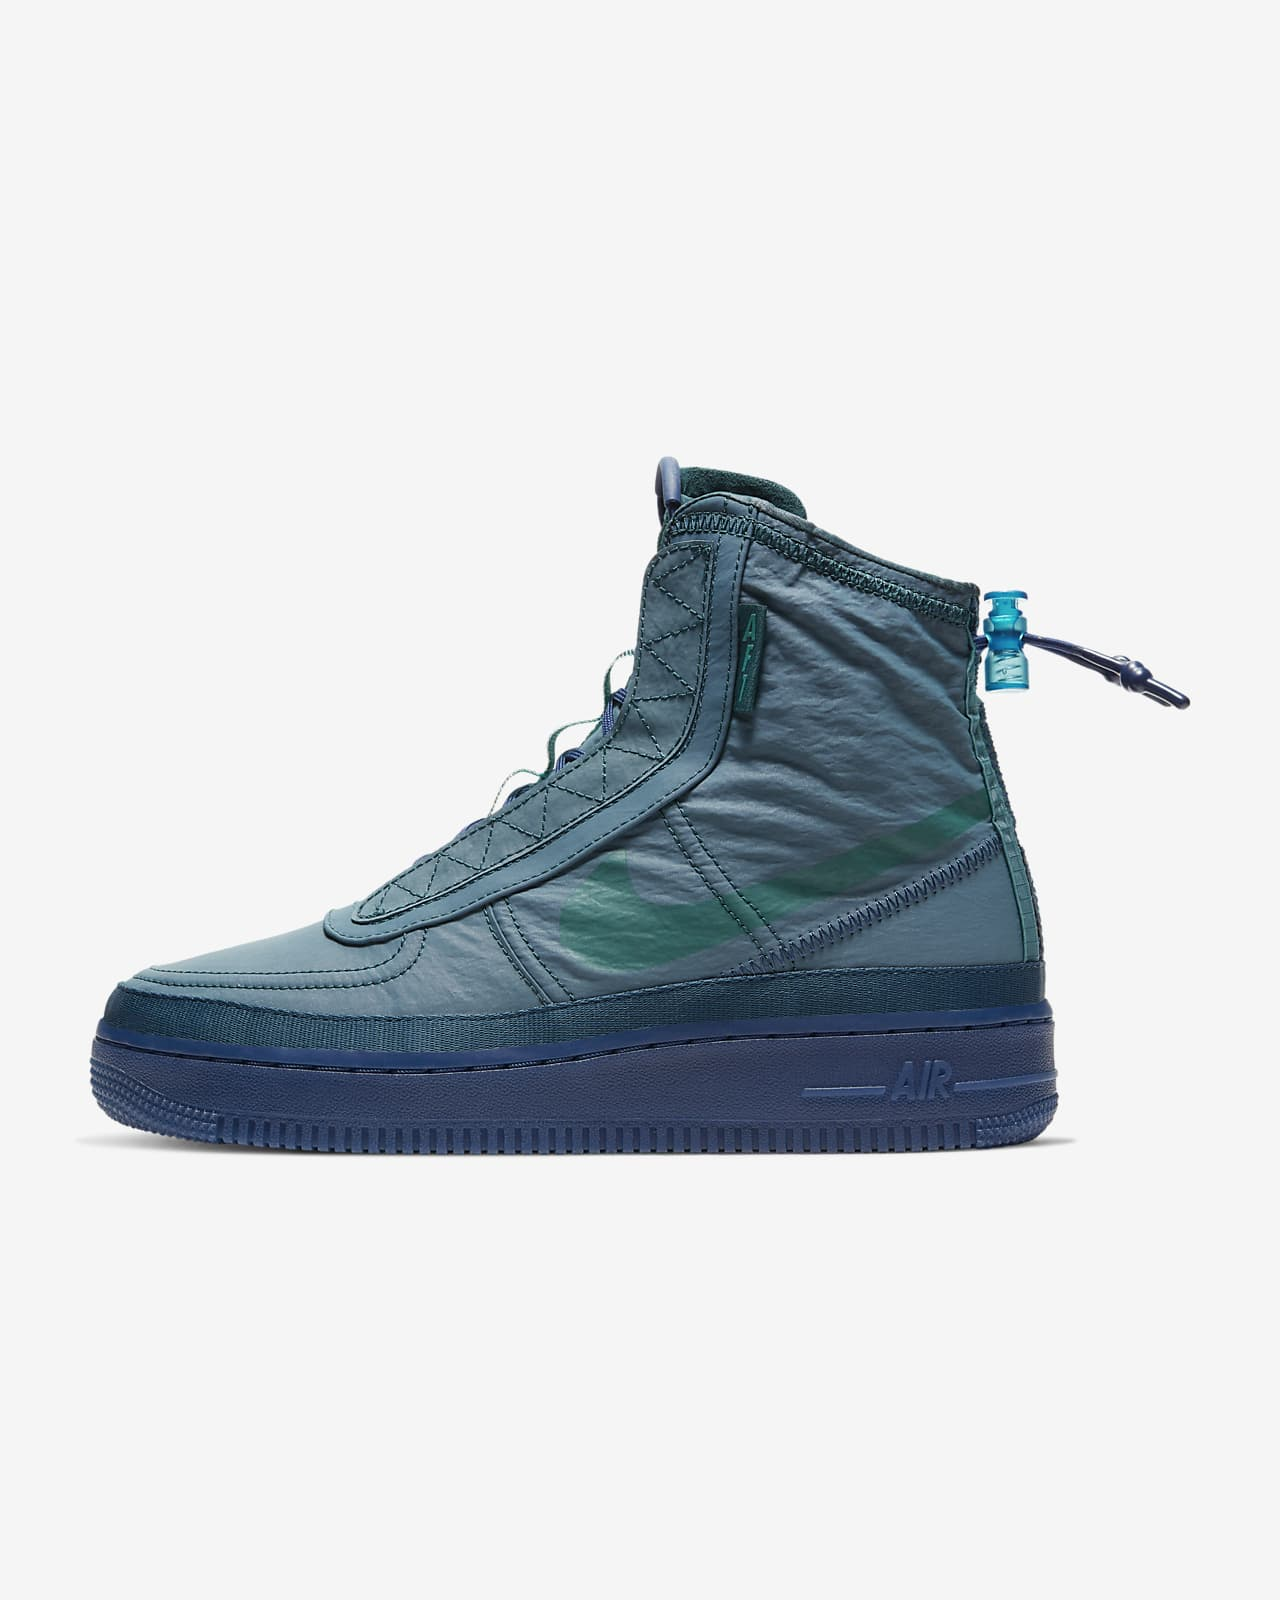 air force 1 femme bleu turquoise